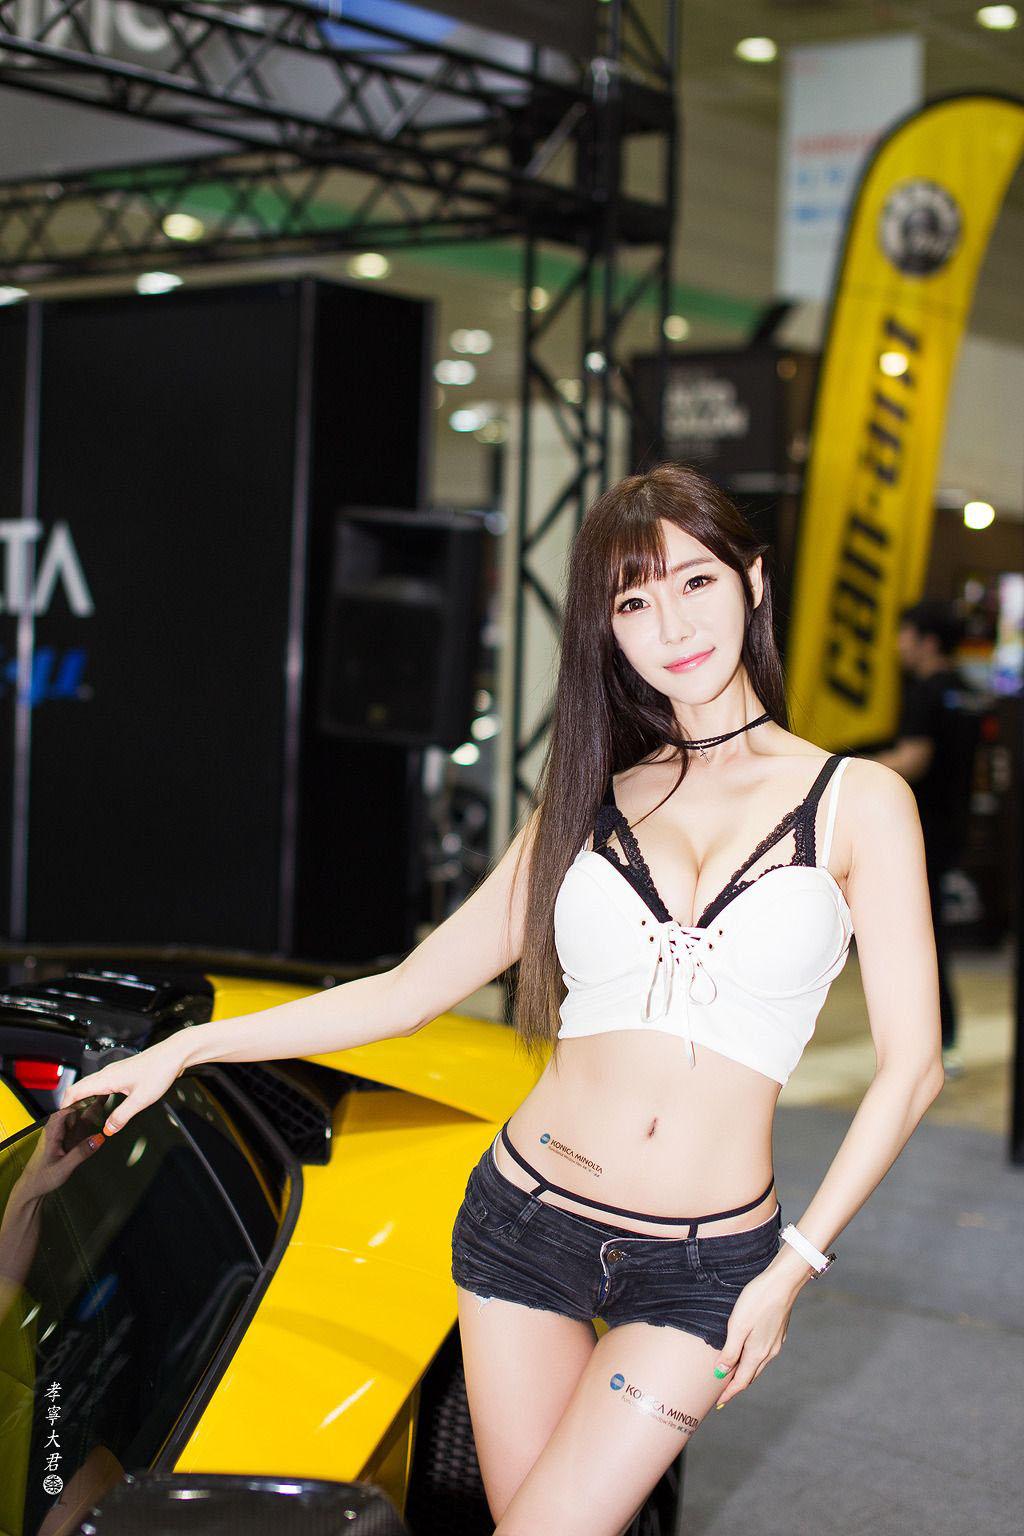 Korean Model Choi Seul Gi - 2016Seoul Auto Salon